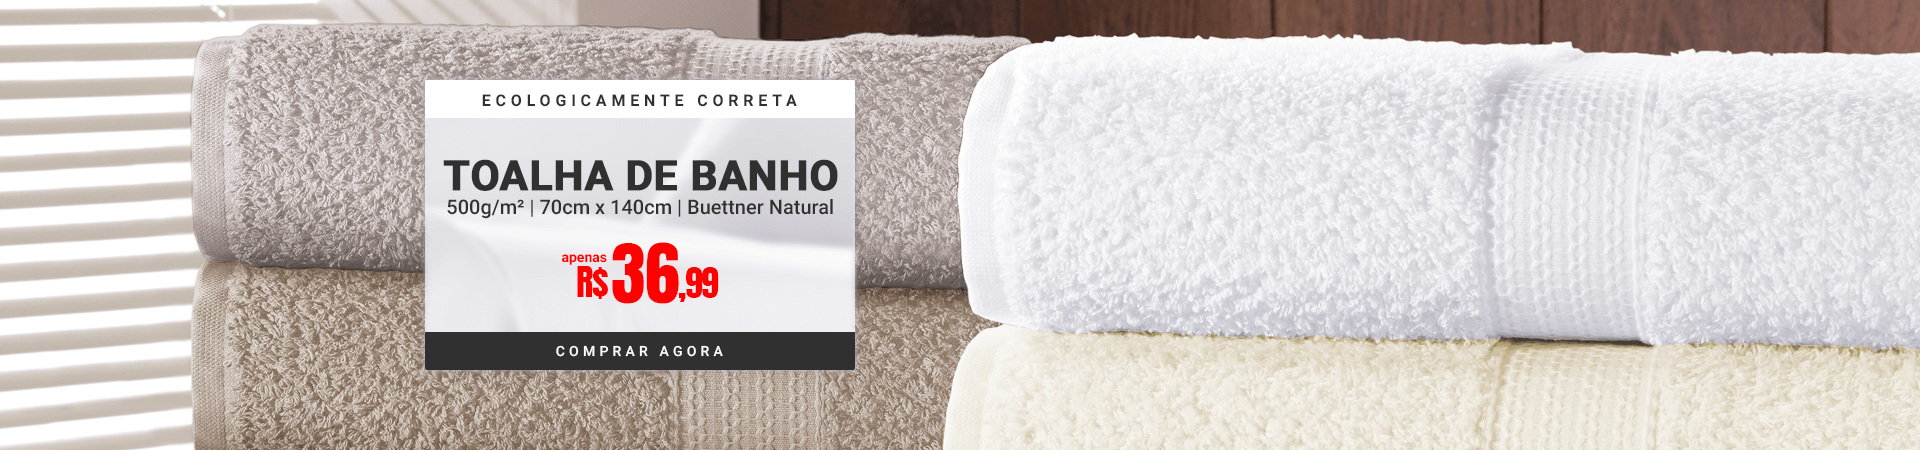 Toalha de Banho Buettner Natural >> Loja Buettner | Comprar Agora!